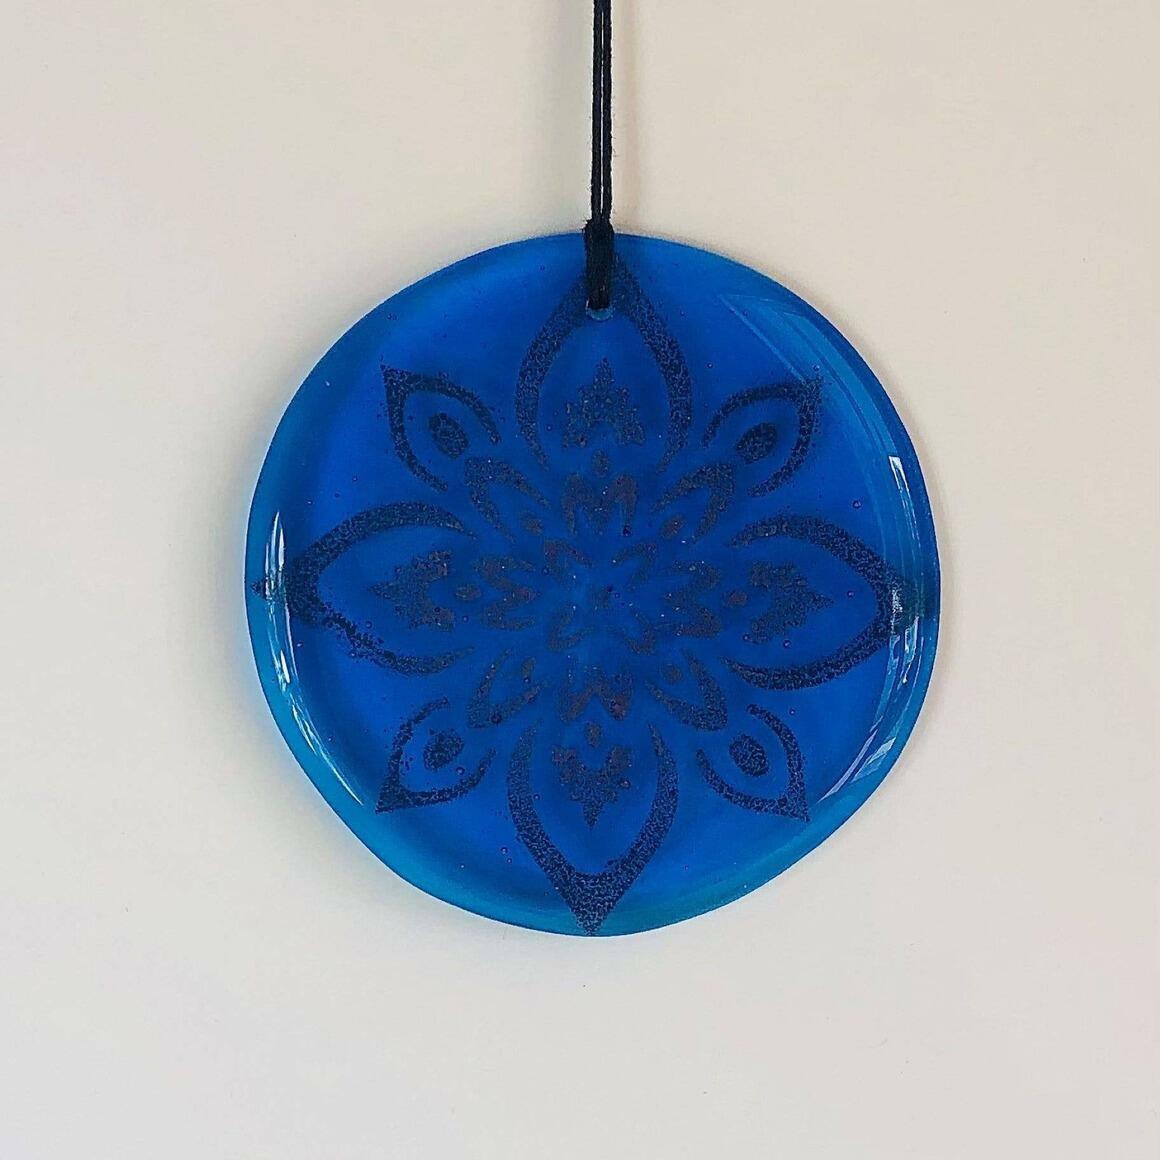 Glass Mandala Window Ornament Suncatcher - True Blue | Trada Marketplace